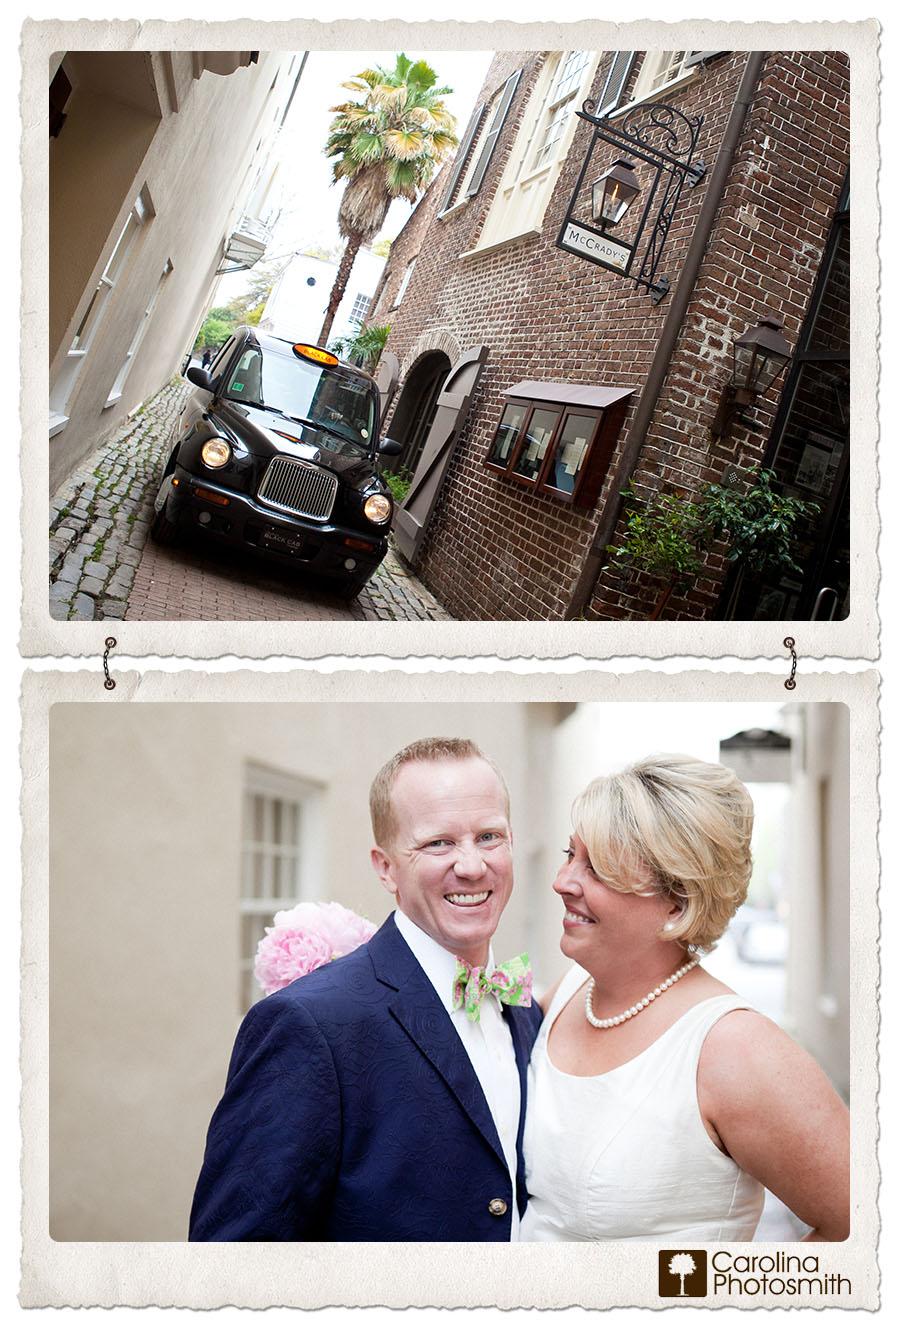 Charleston newlyweds take Black Cab into tiny Unity Alley for reception at McCrady